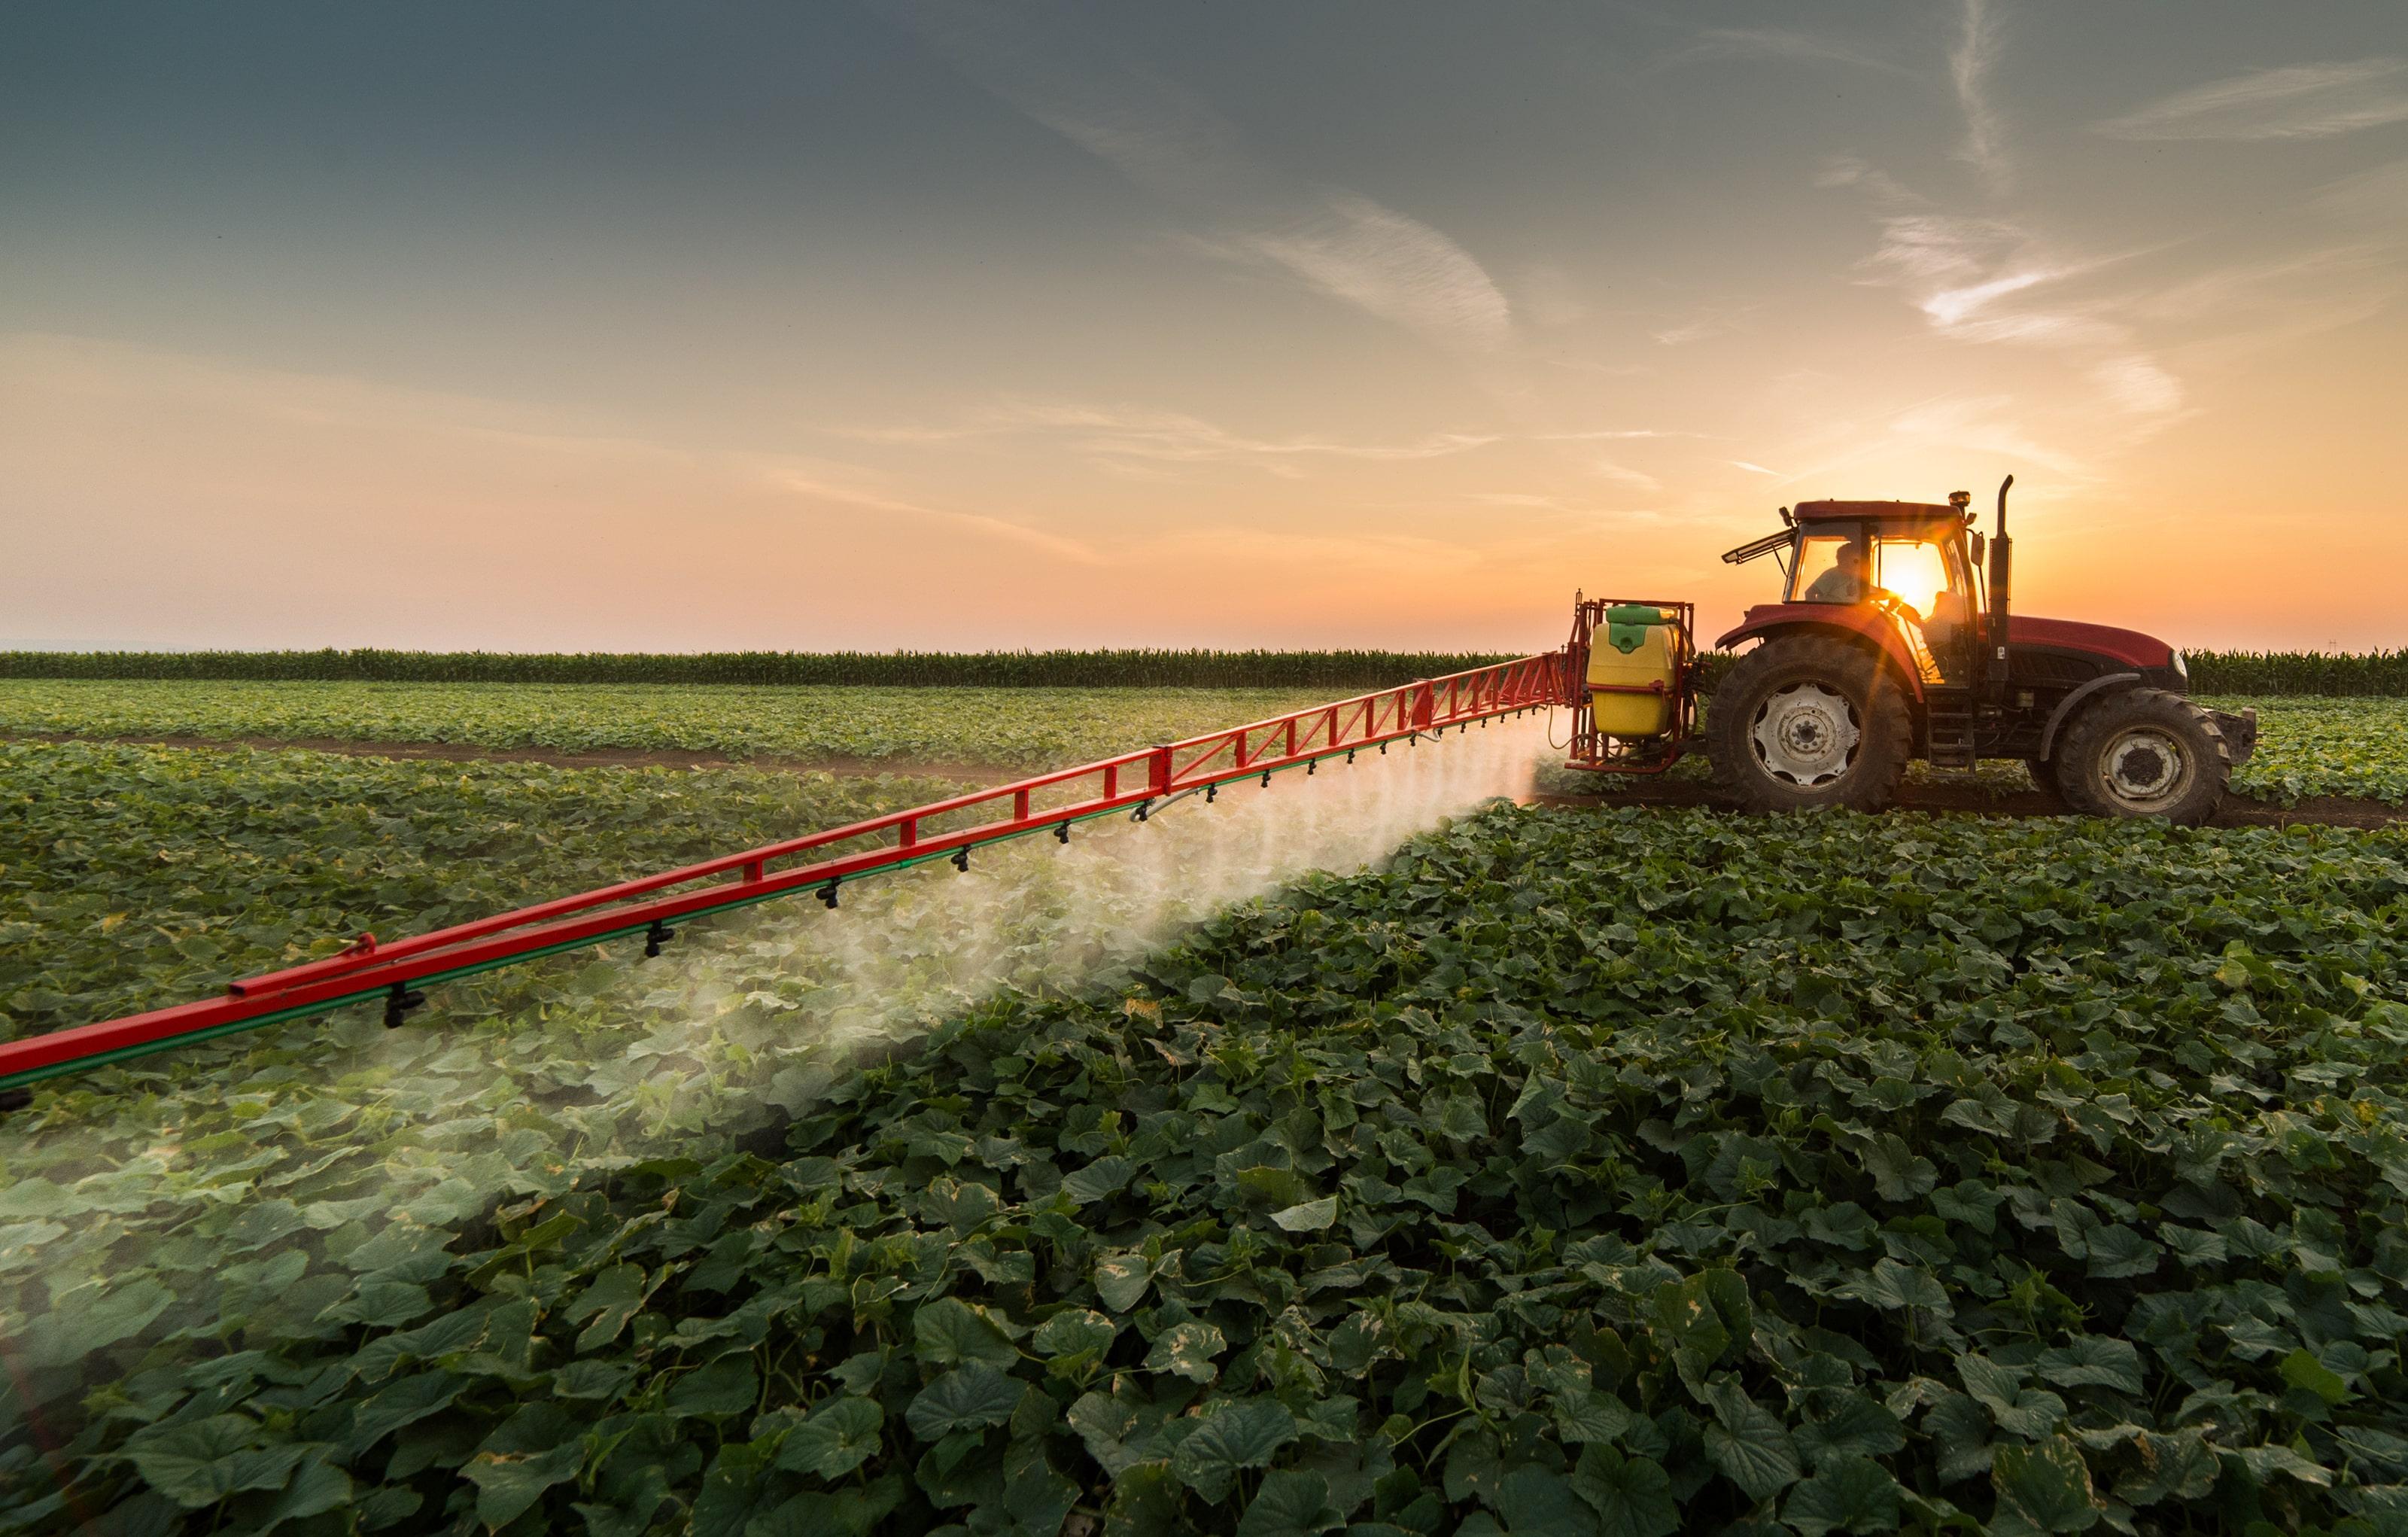 tratores agricolas fazem a pulverizacao na agricultura digital